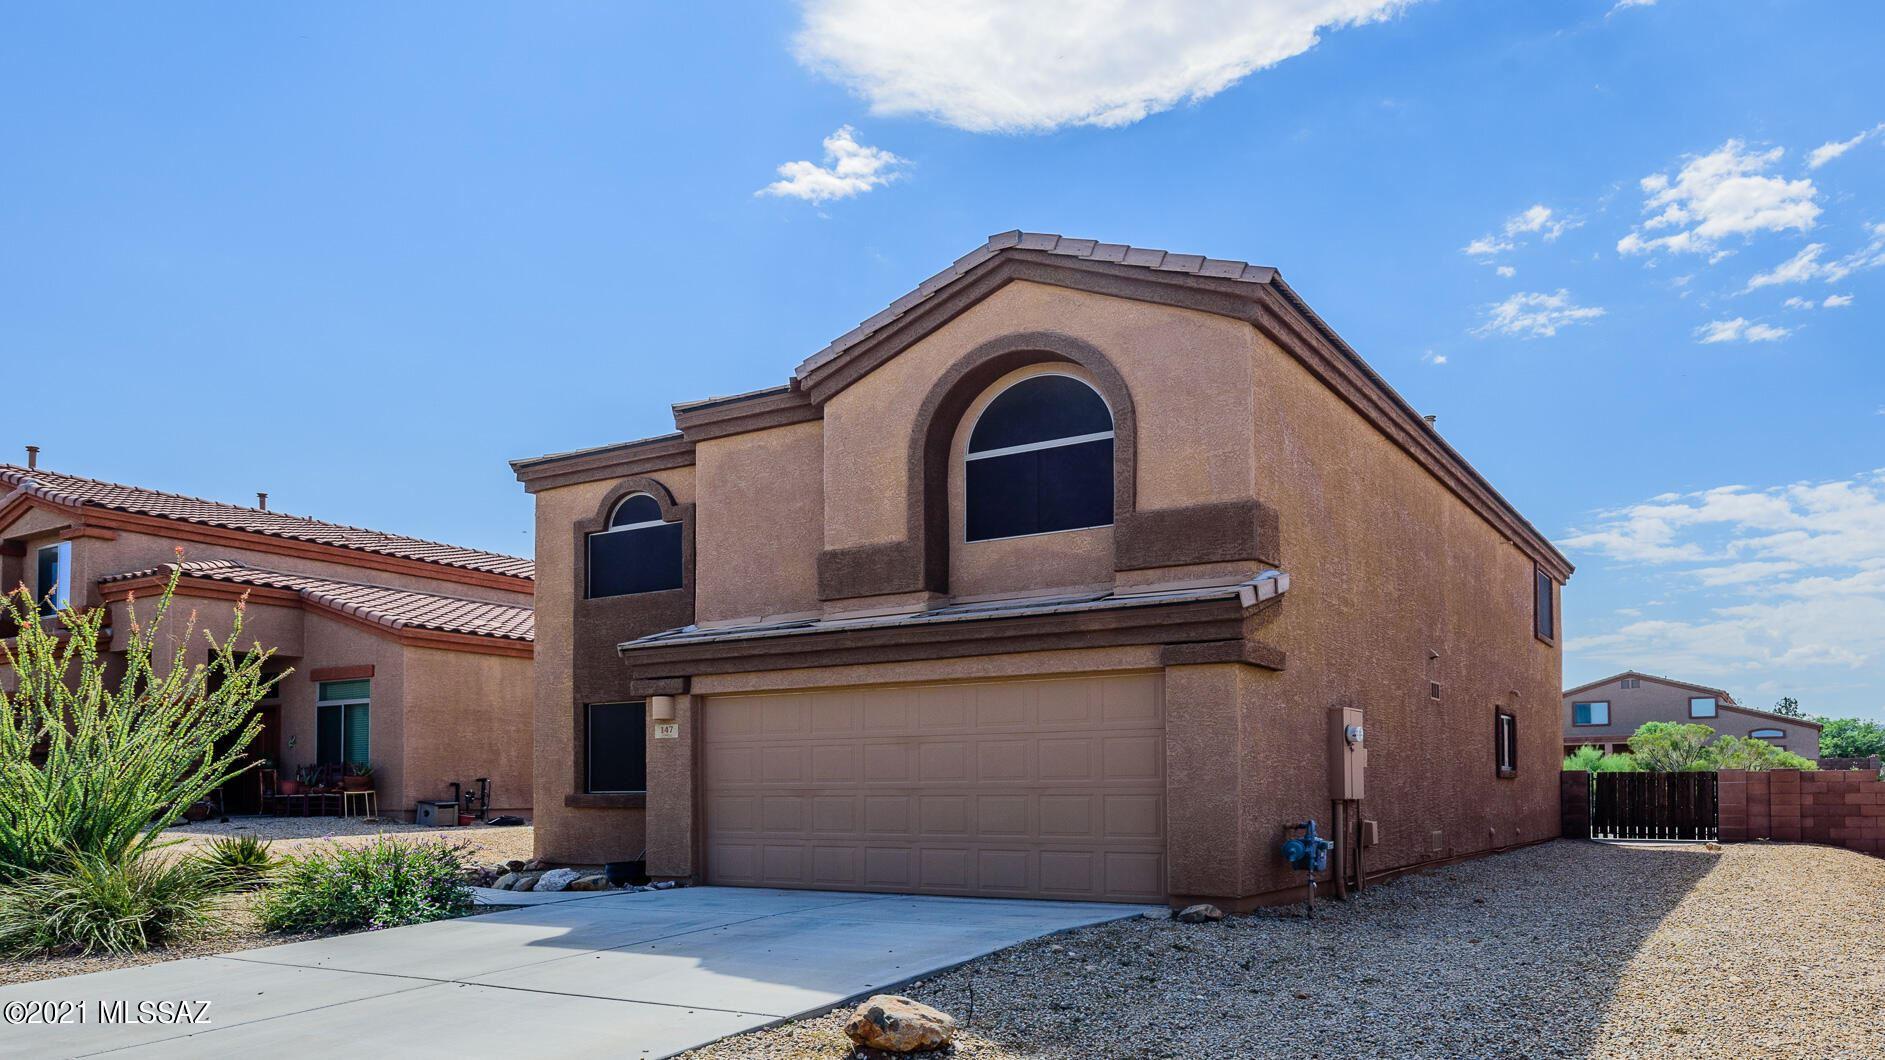 147 W Cheevers St Street, Corona de Tucson, AZ 85641 - MLS#: 22121135